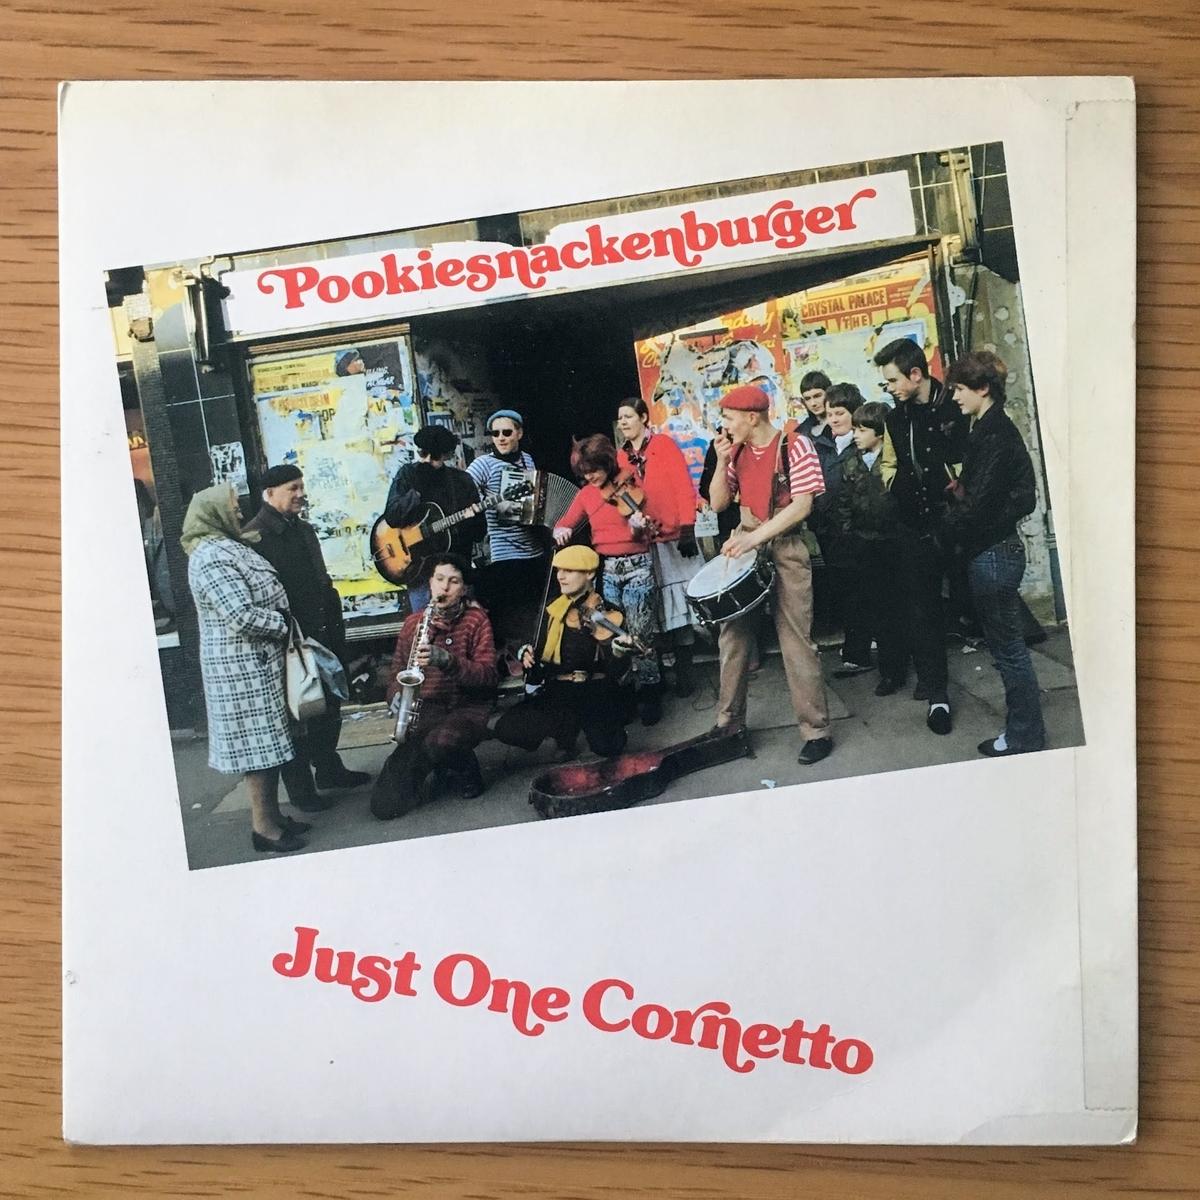 POOKIESNACKENBURGERのJust One Cornetto